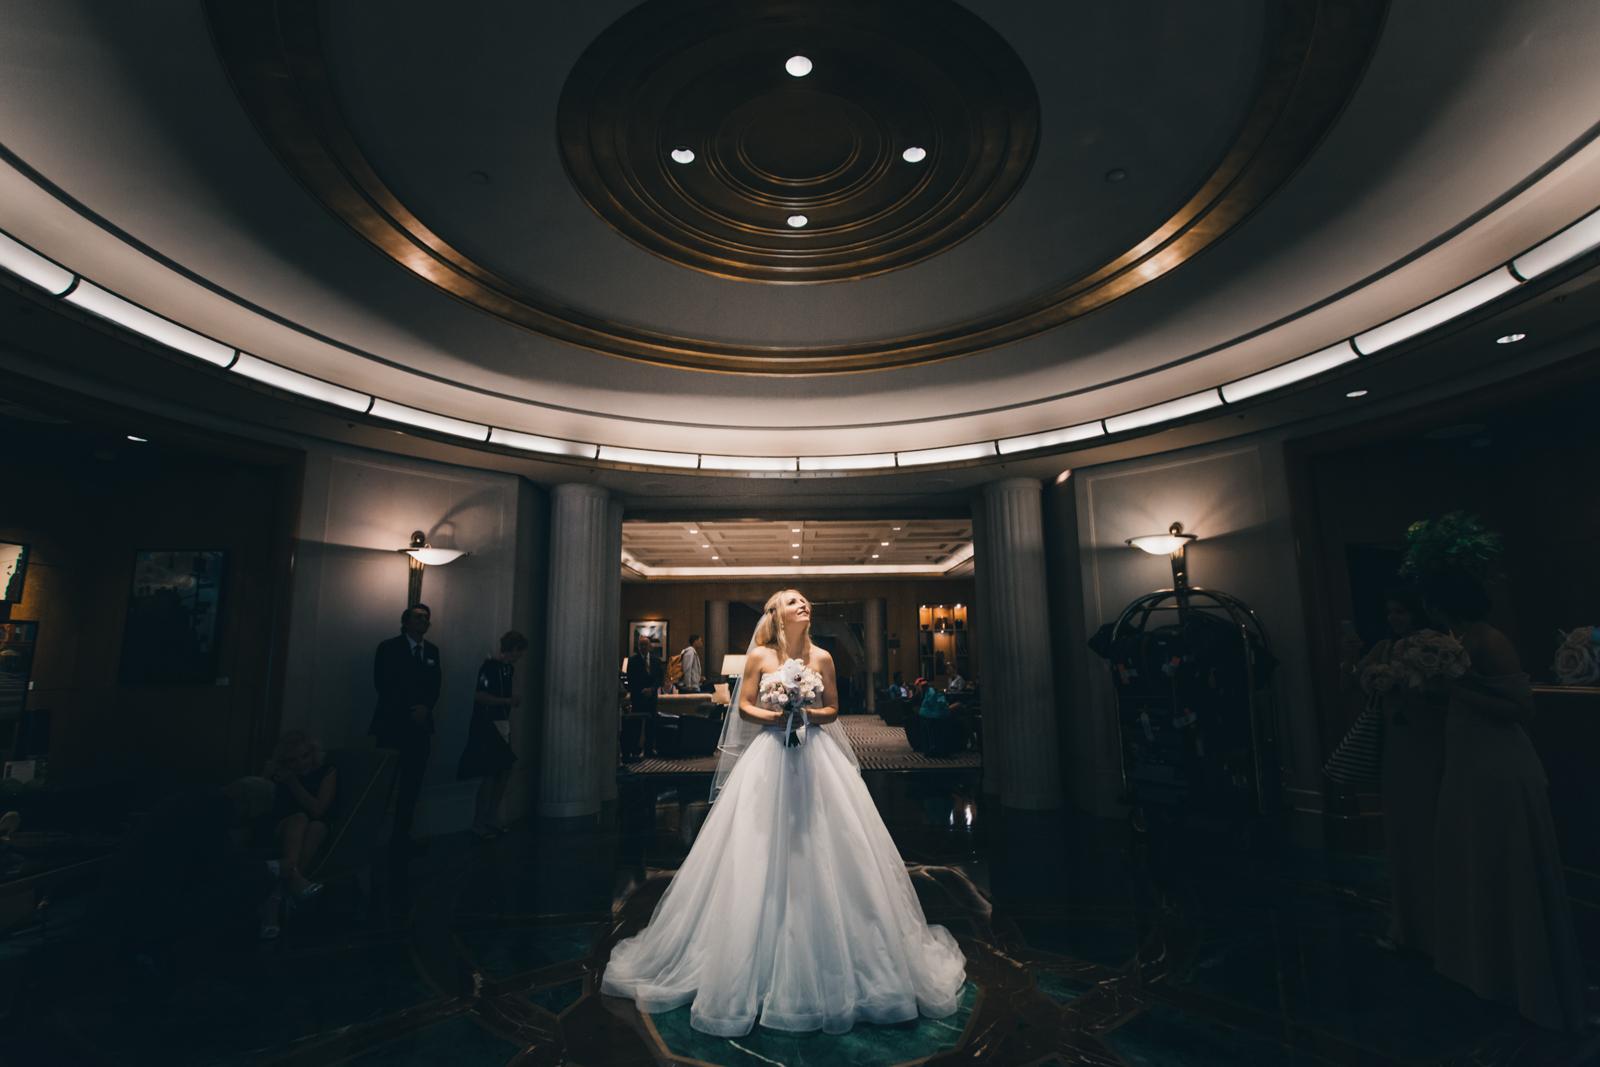 NYC Wedding Photography Sofitel Central Park Brooklyn Photographer Boris Zaretsky _B2C2116.jpg